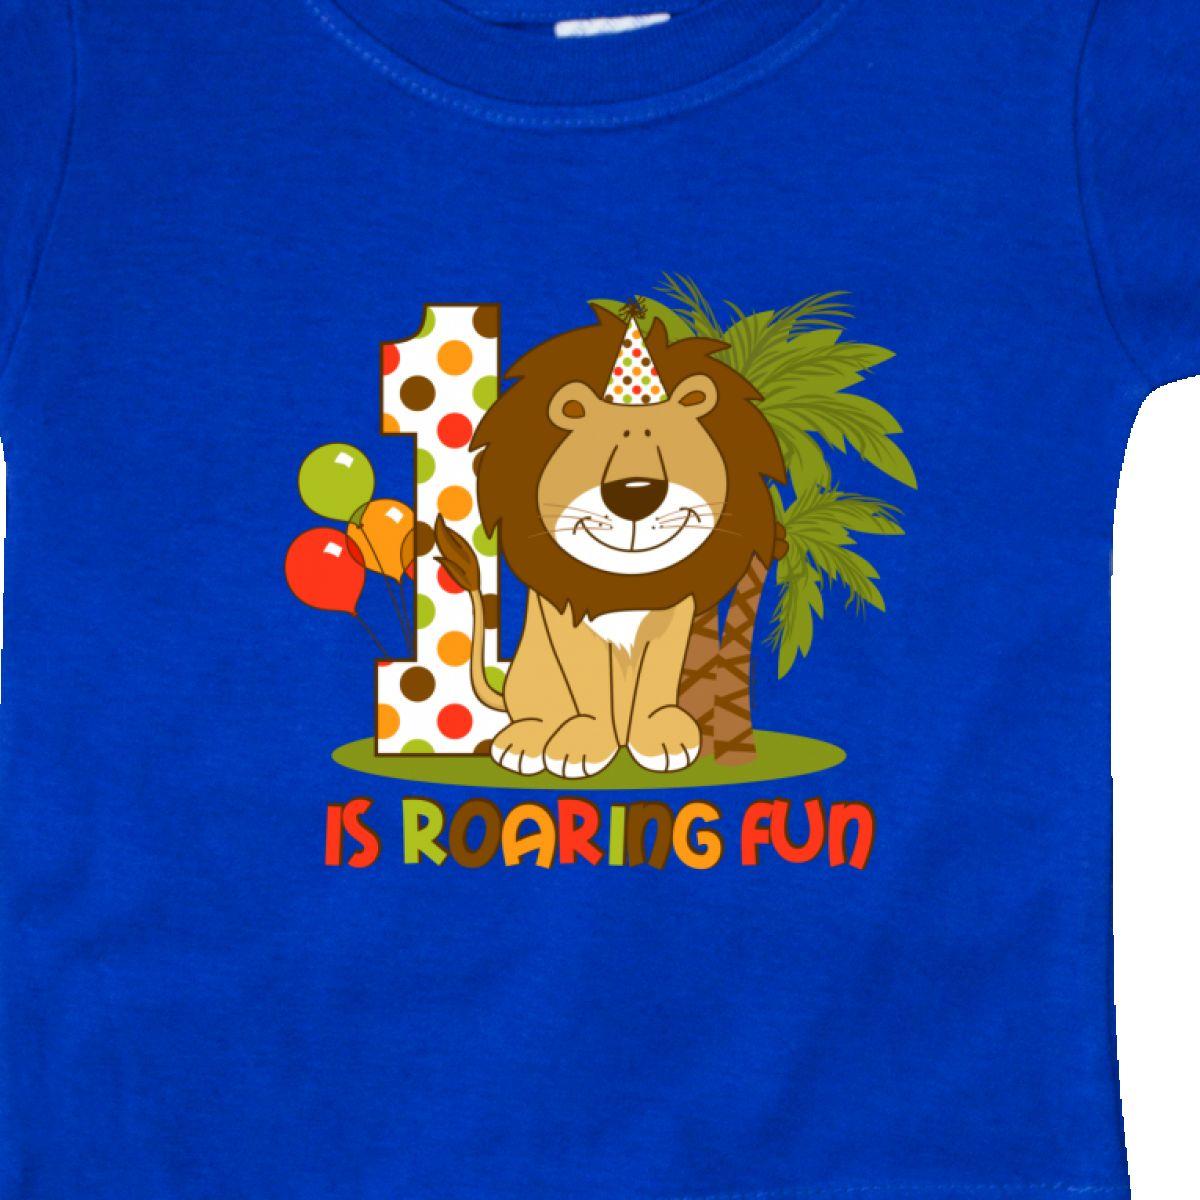 Inktastic-Cute-Lion-1st-Birthday-Baby-T-Shirt-Roaring-Fun-Pinkinkartkids-First thumbnail 18